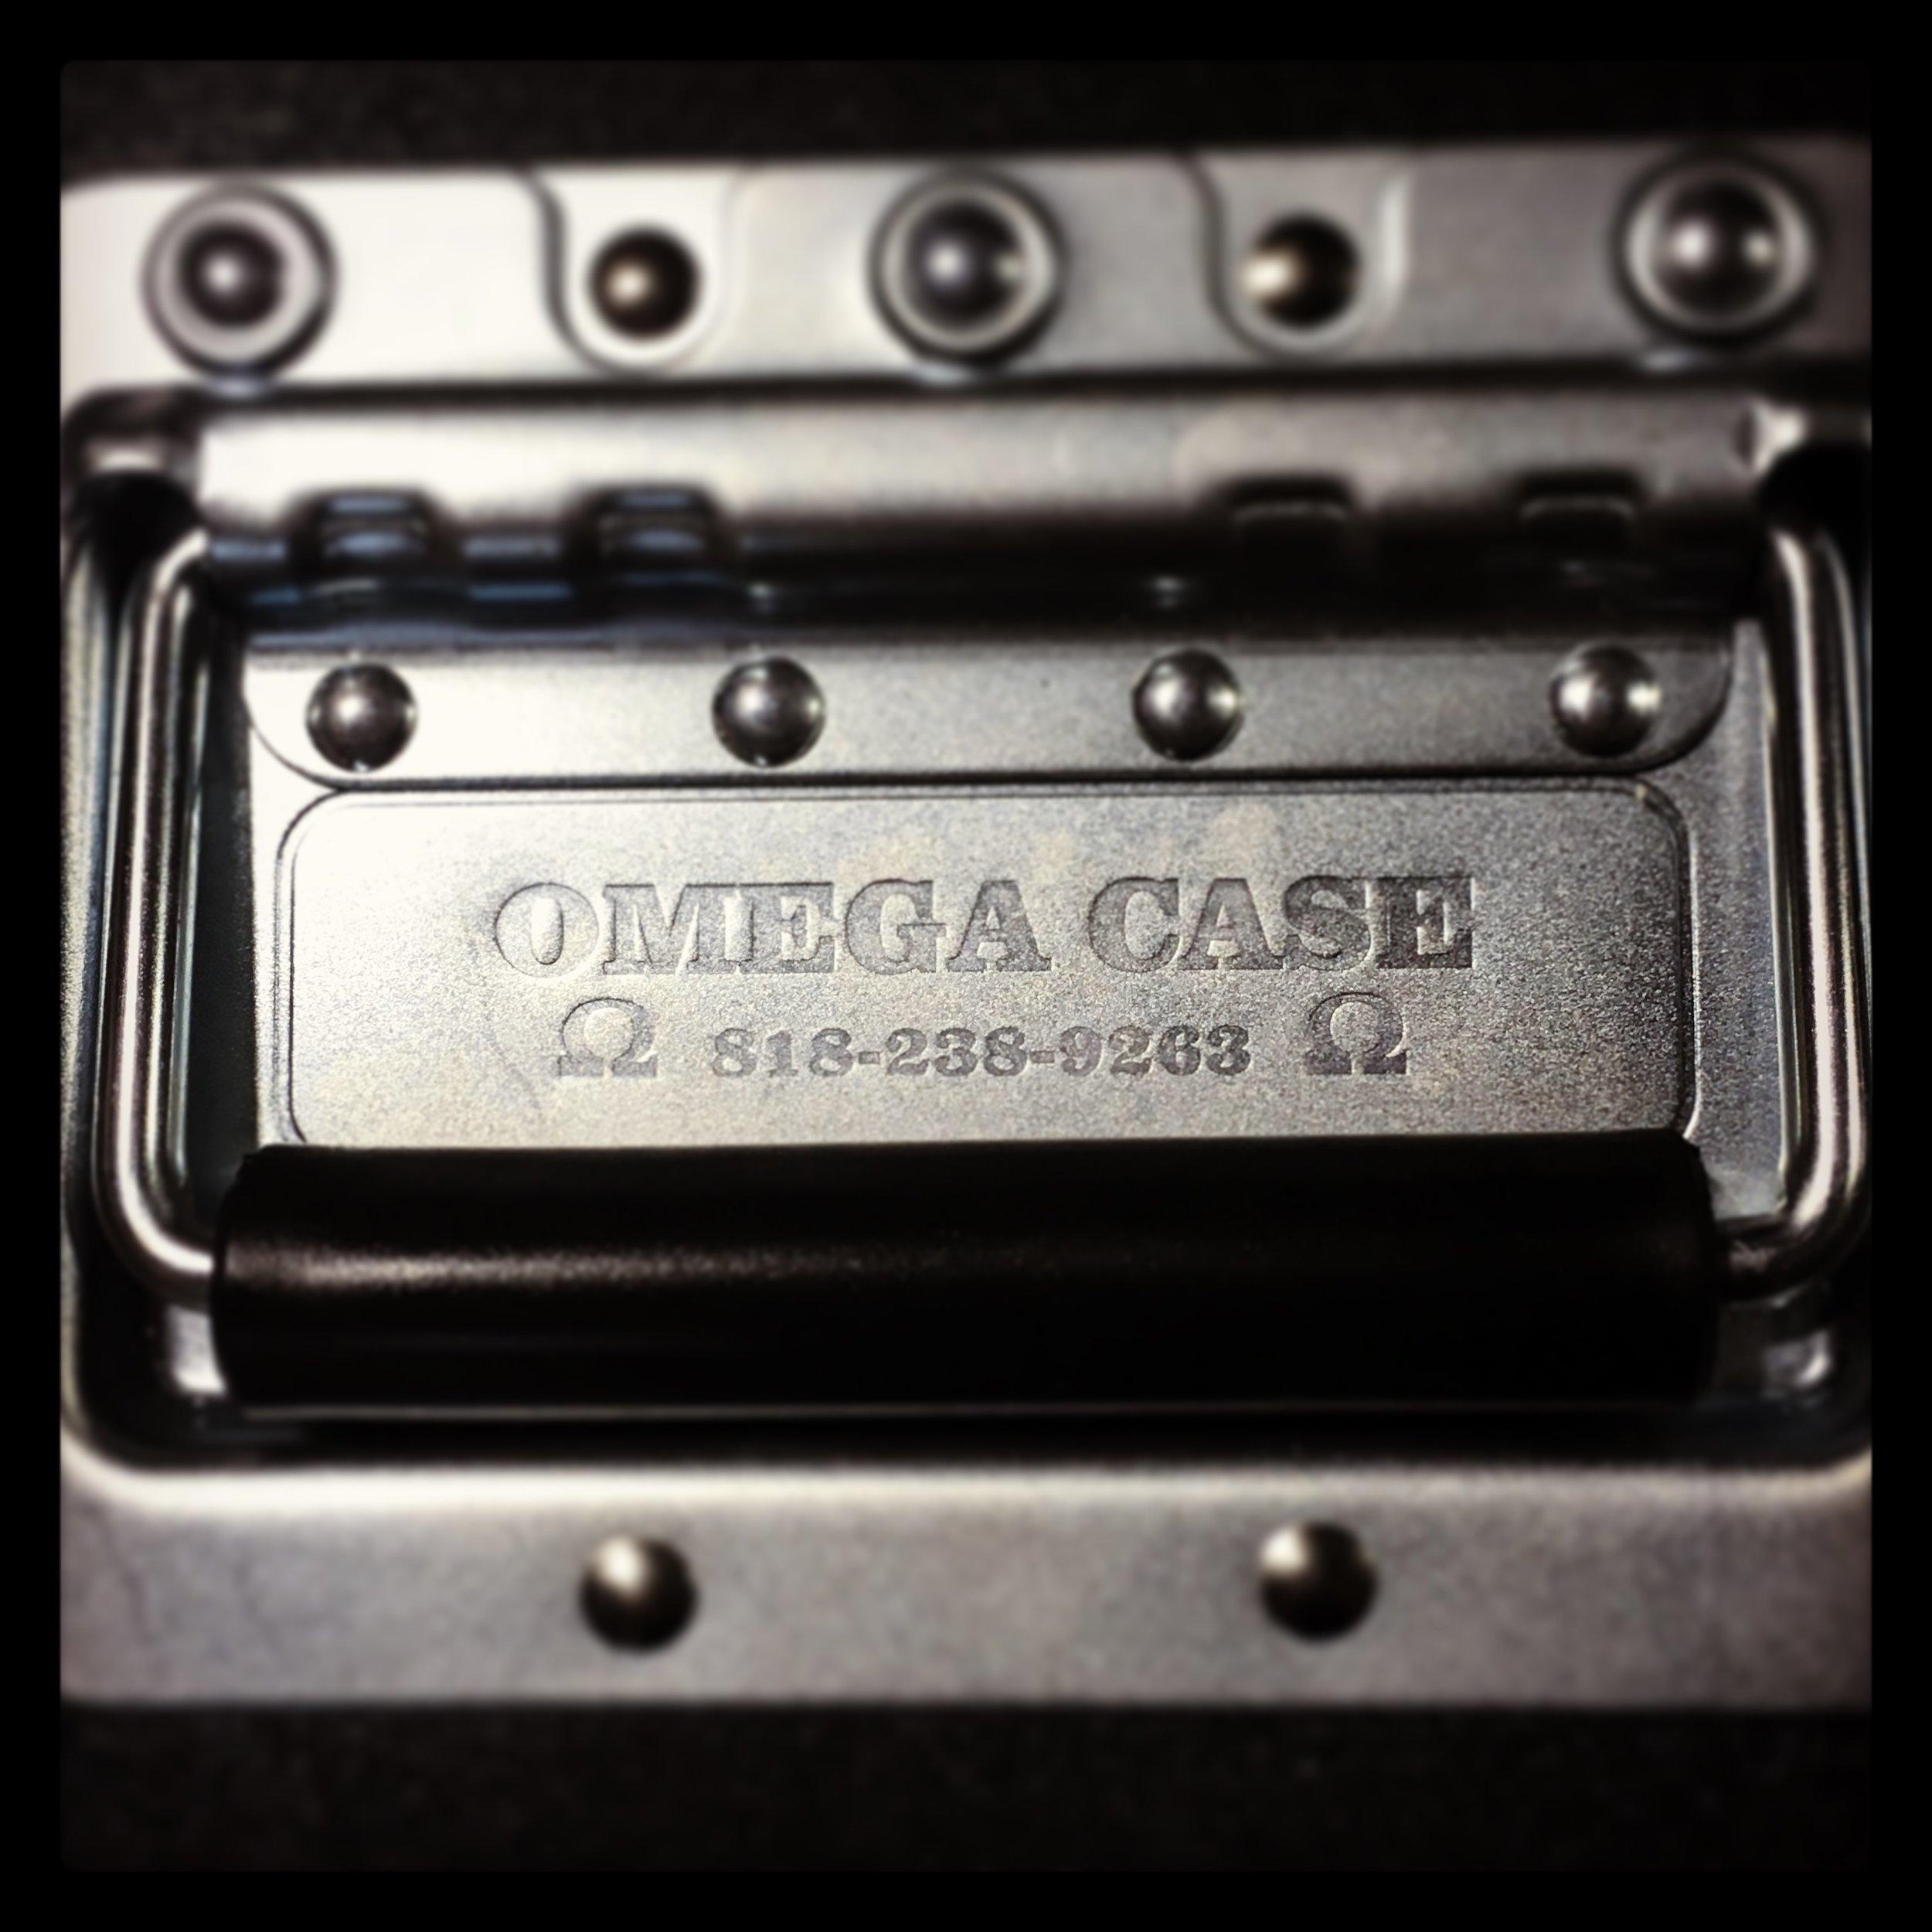 Omega Case Handle